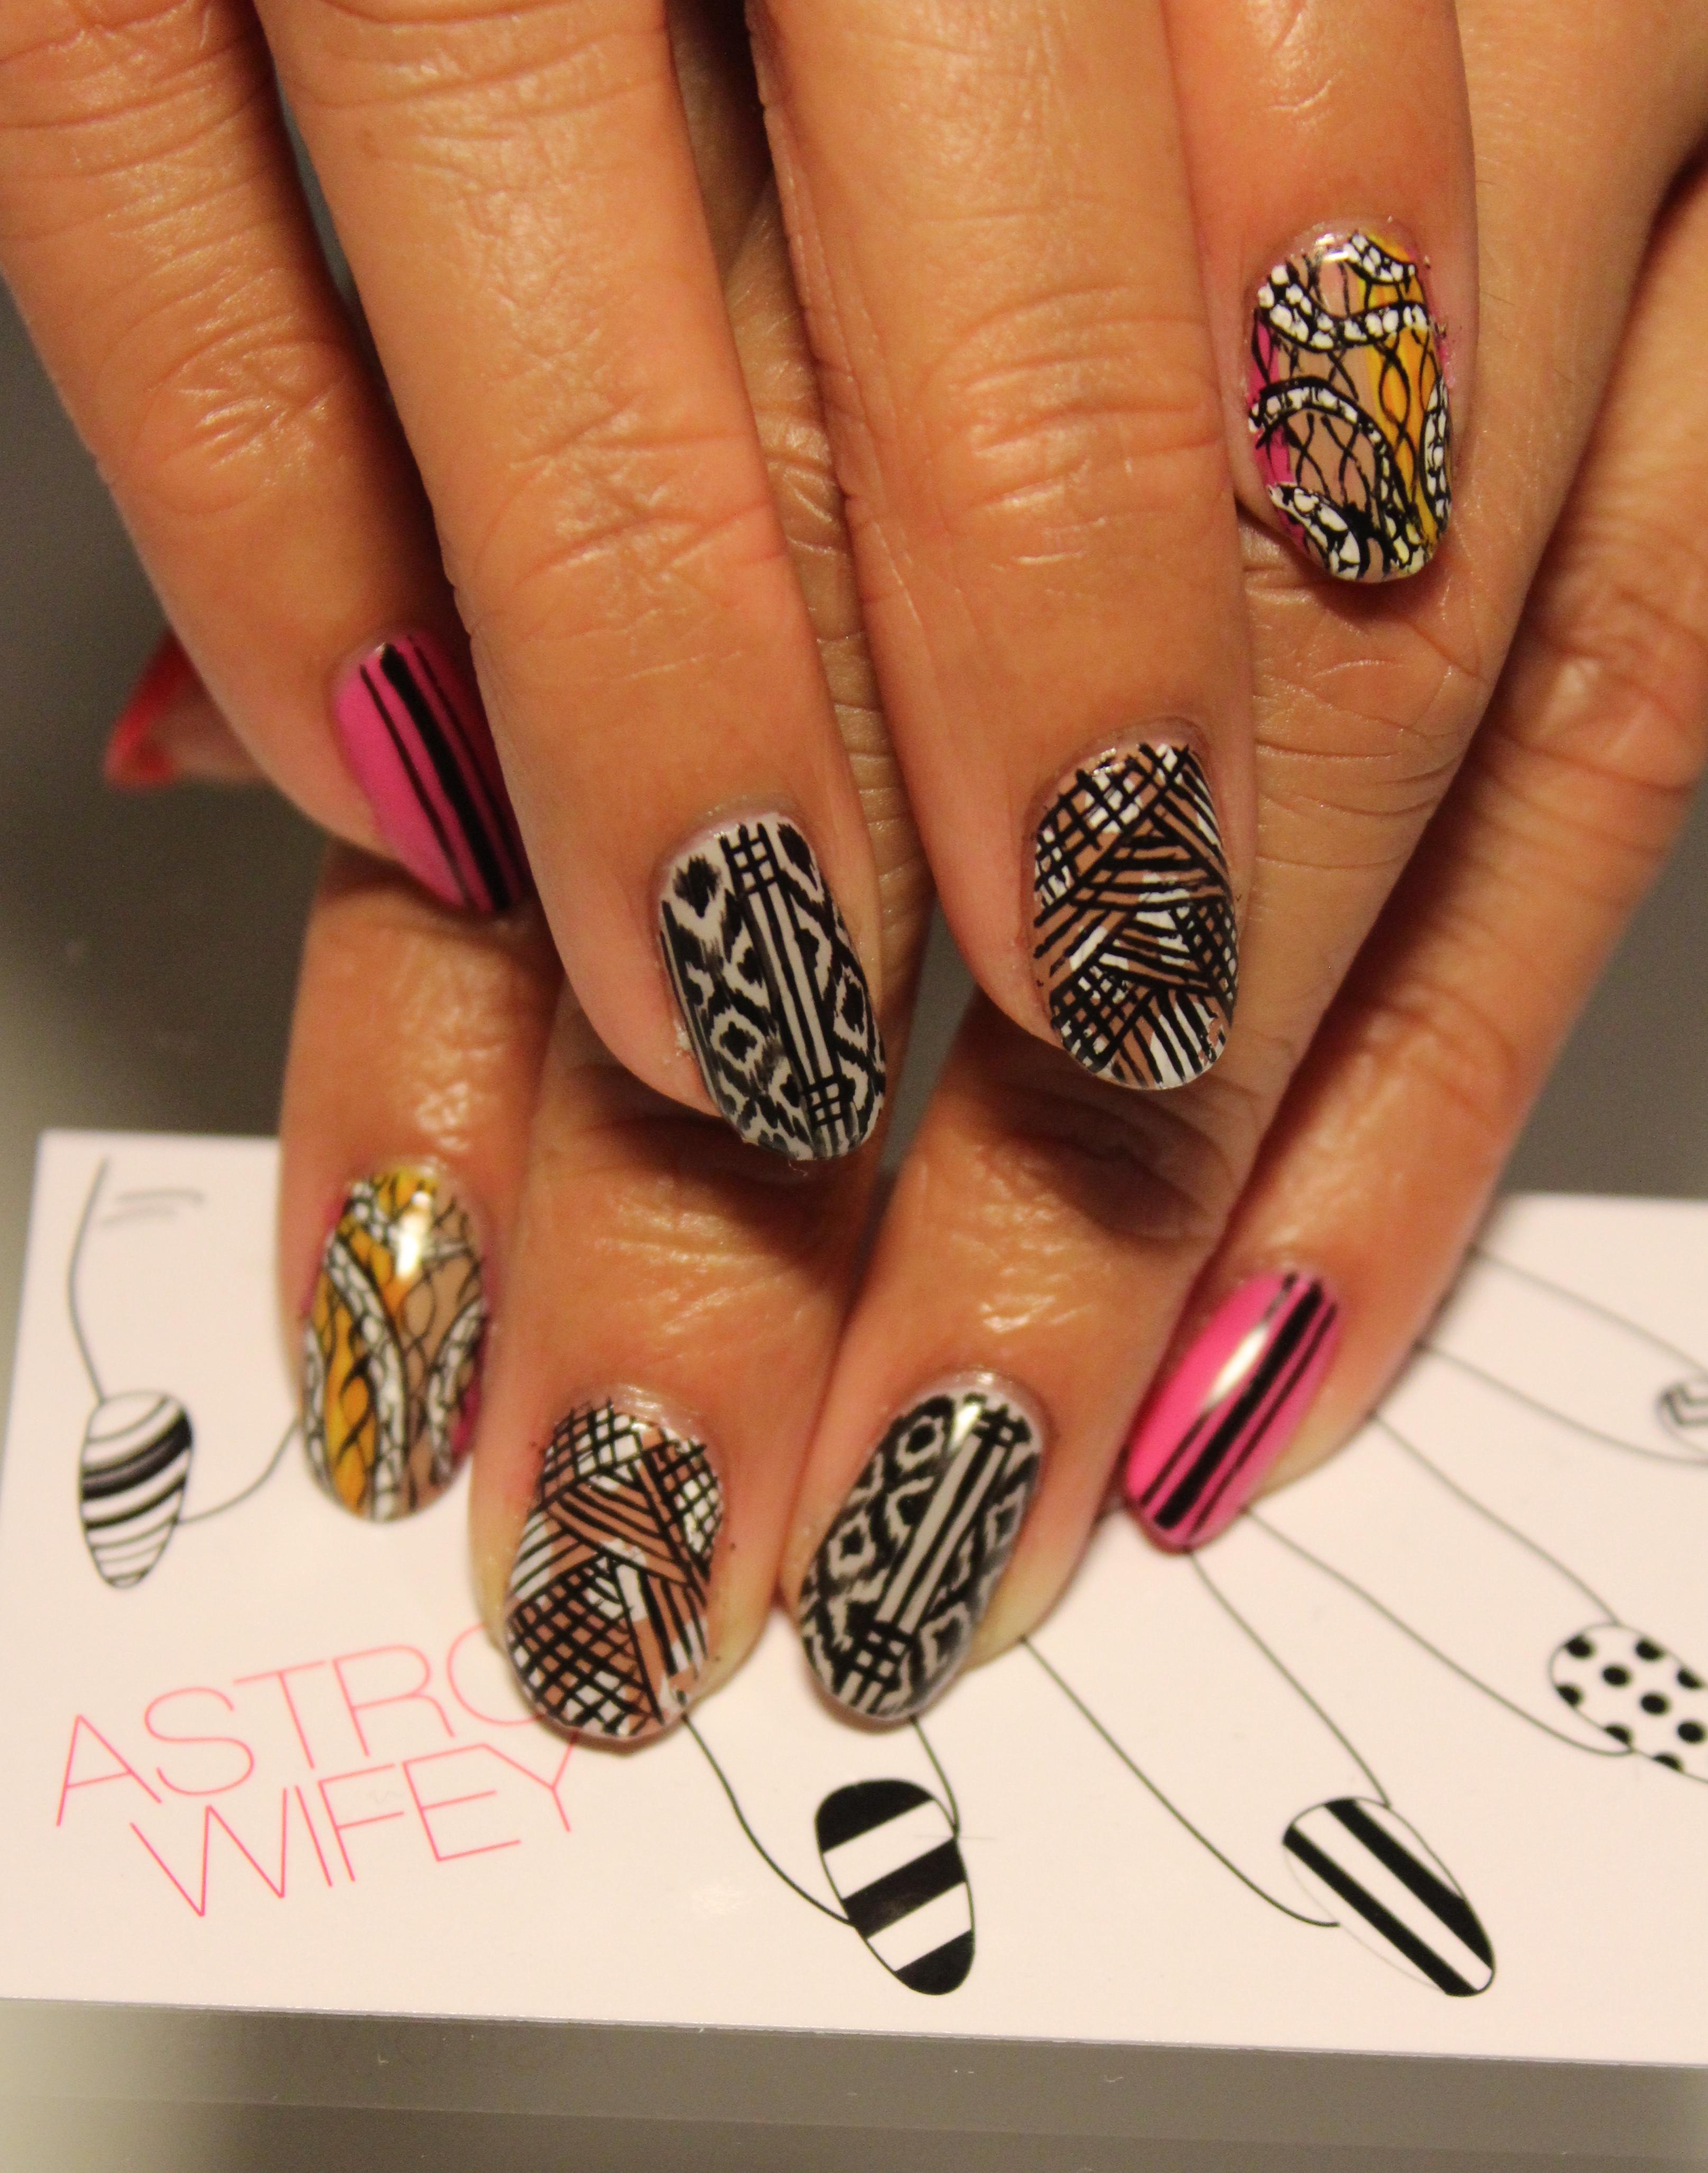 astrowifey | Designer Manicurist | Nail Blogger | Page 40